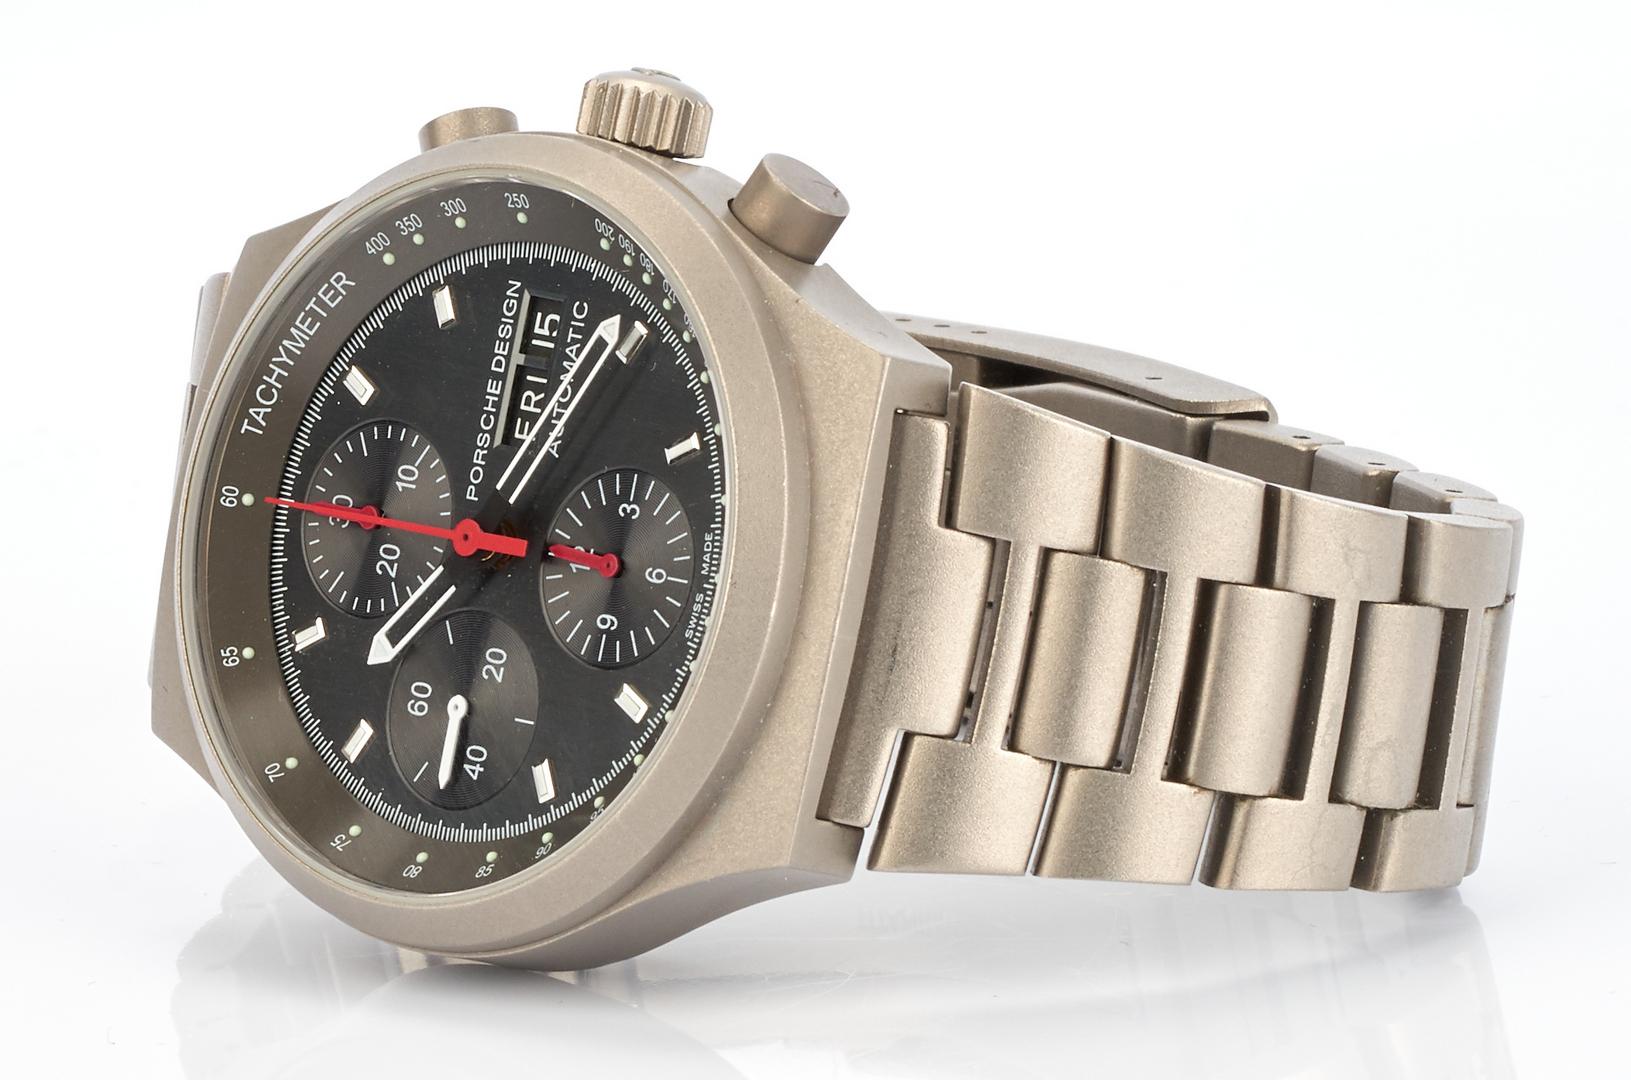 Lot 715: Porsche Design by Eterna Men's Titanium Automatic Watch